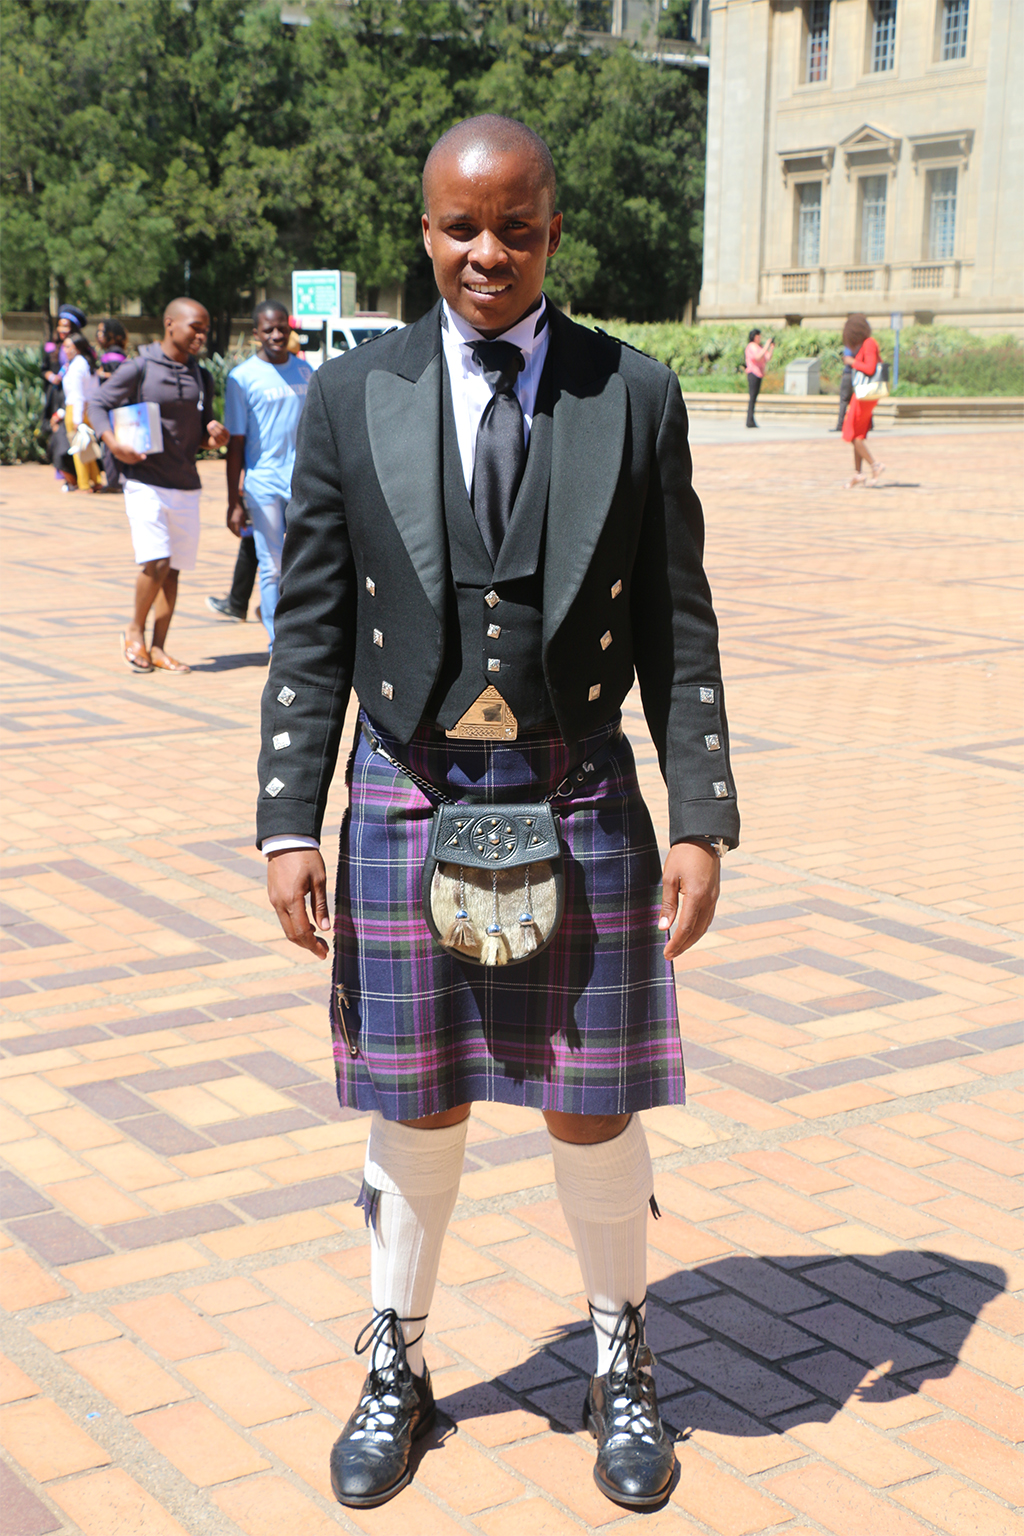 Witsie graduates after Twitter plea for help